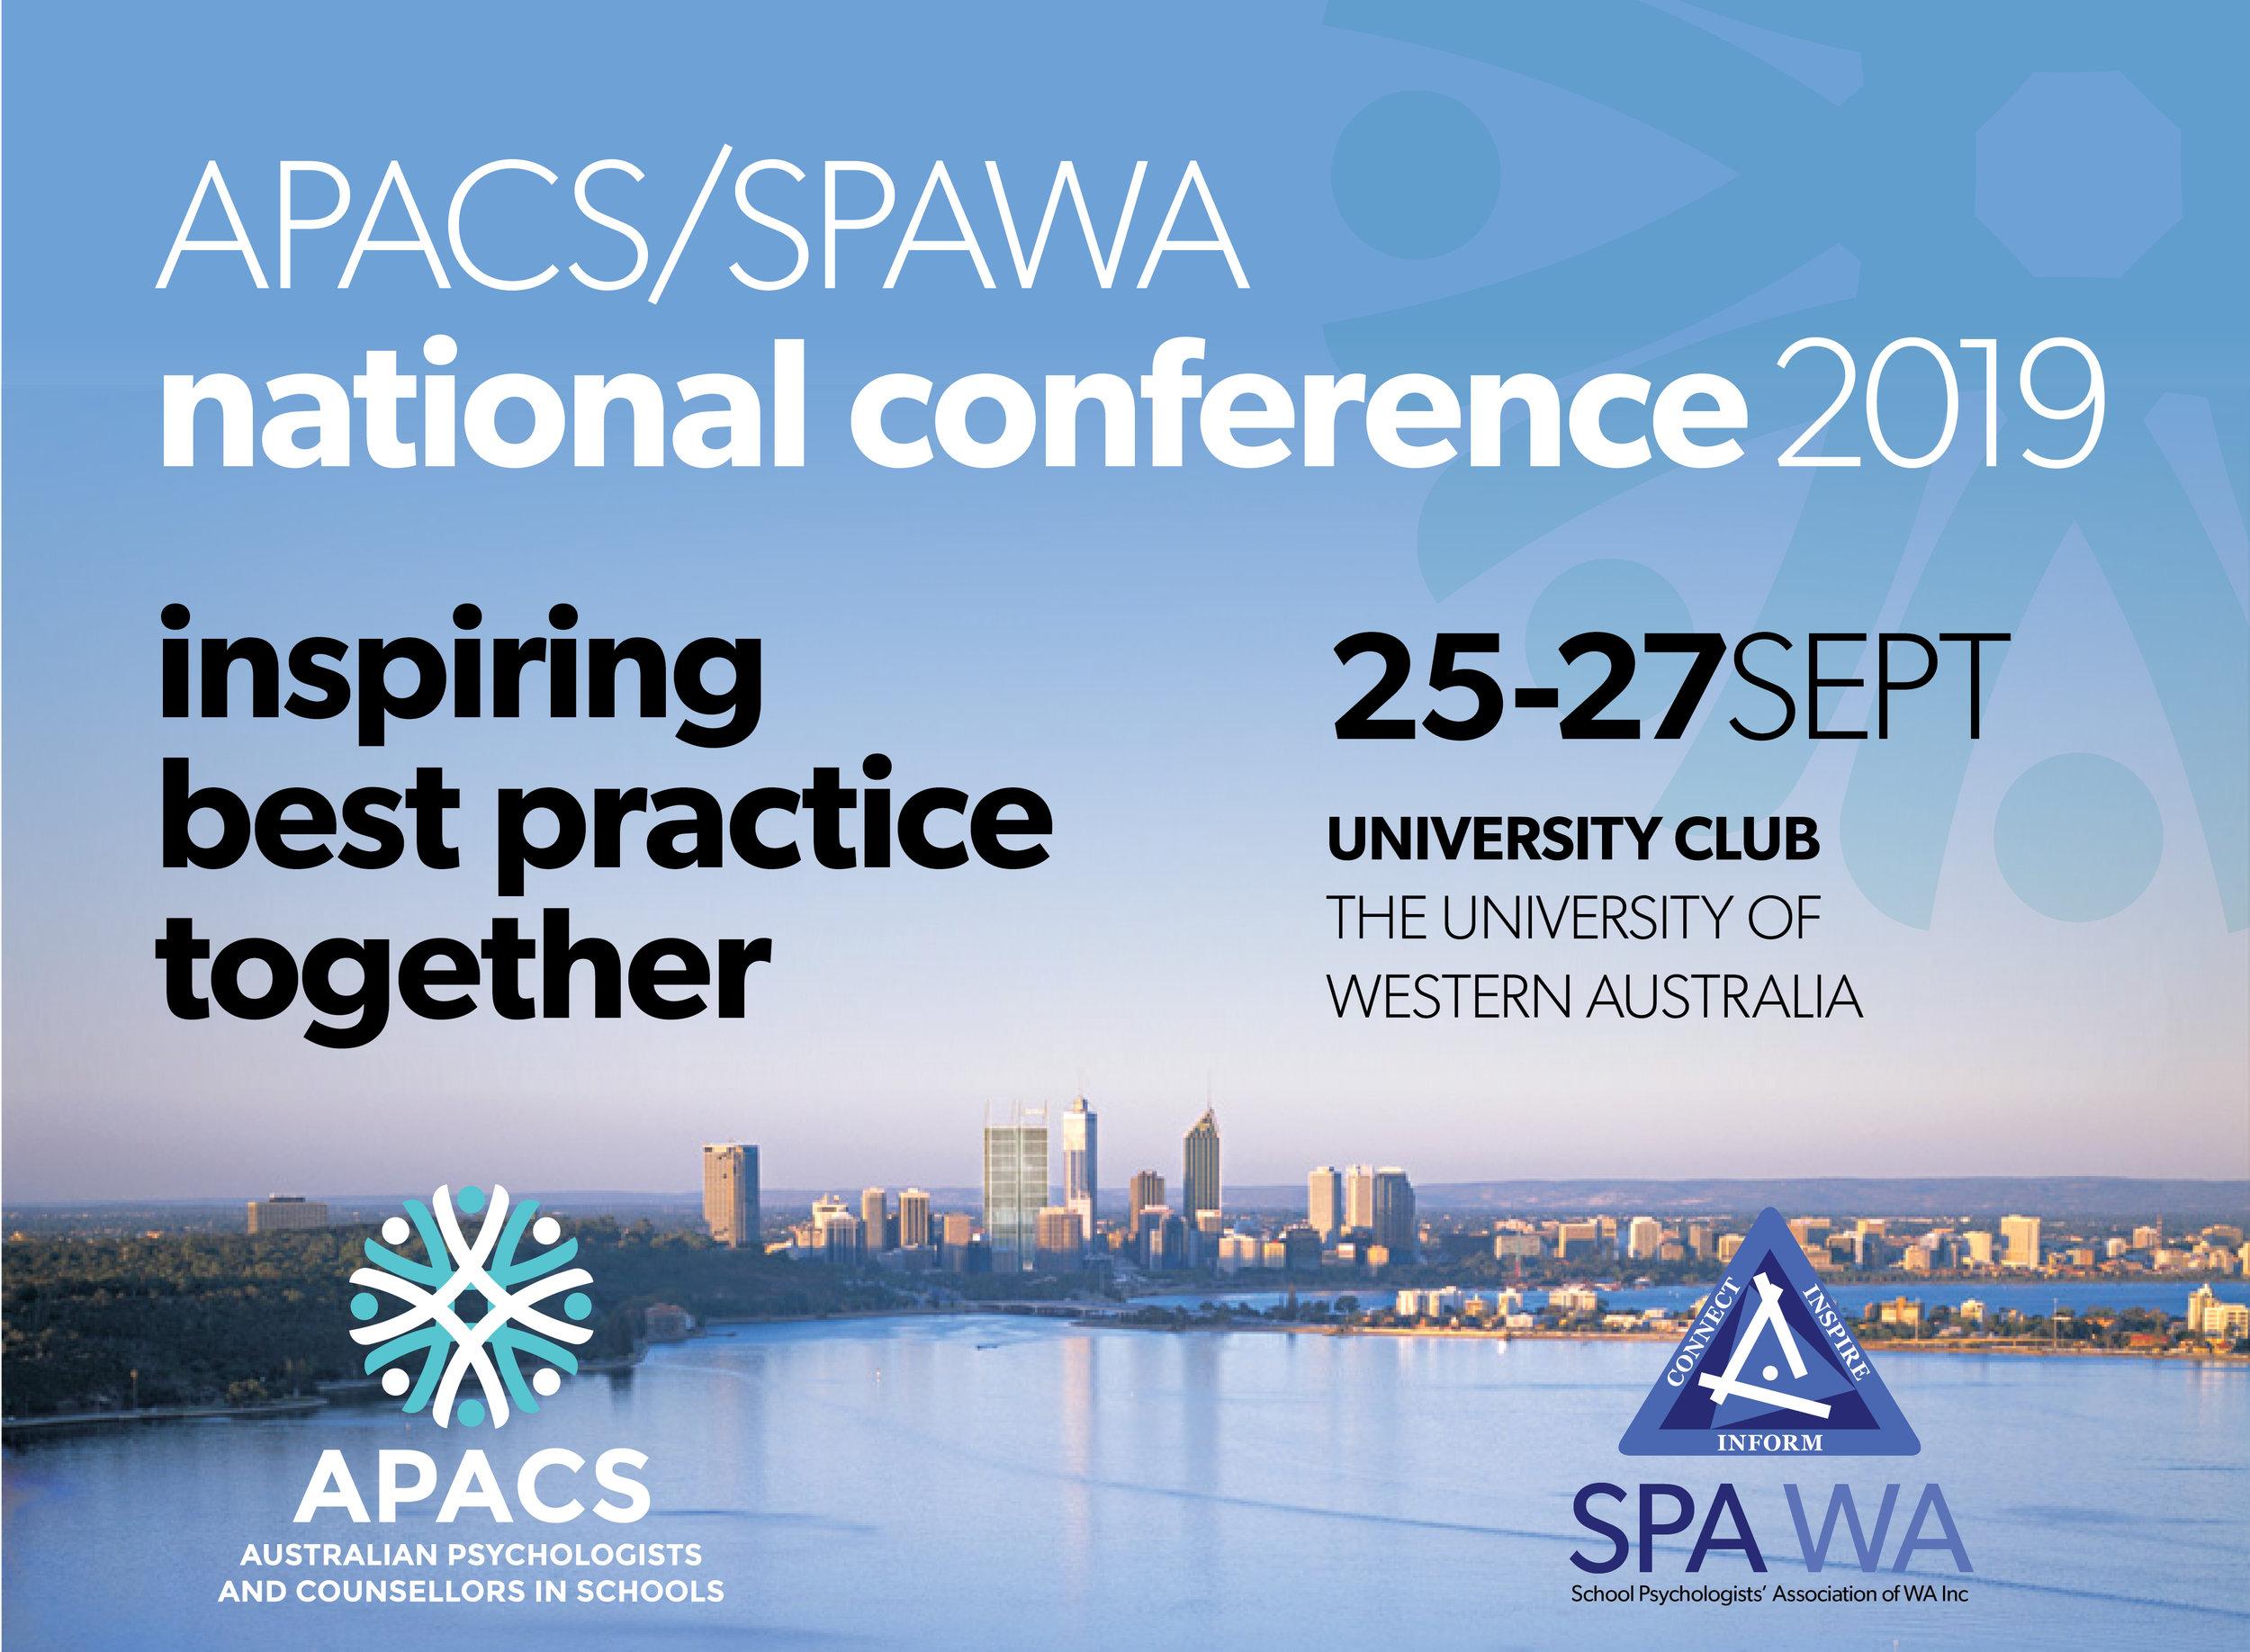 APACS_SPA_conf_postcard.jpg